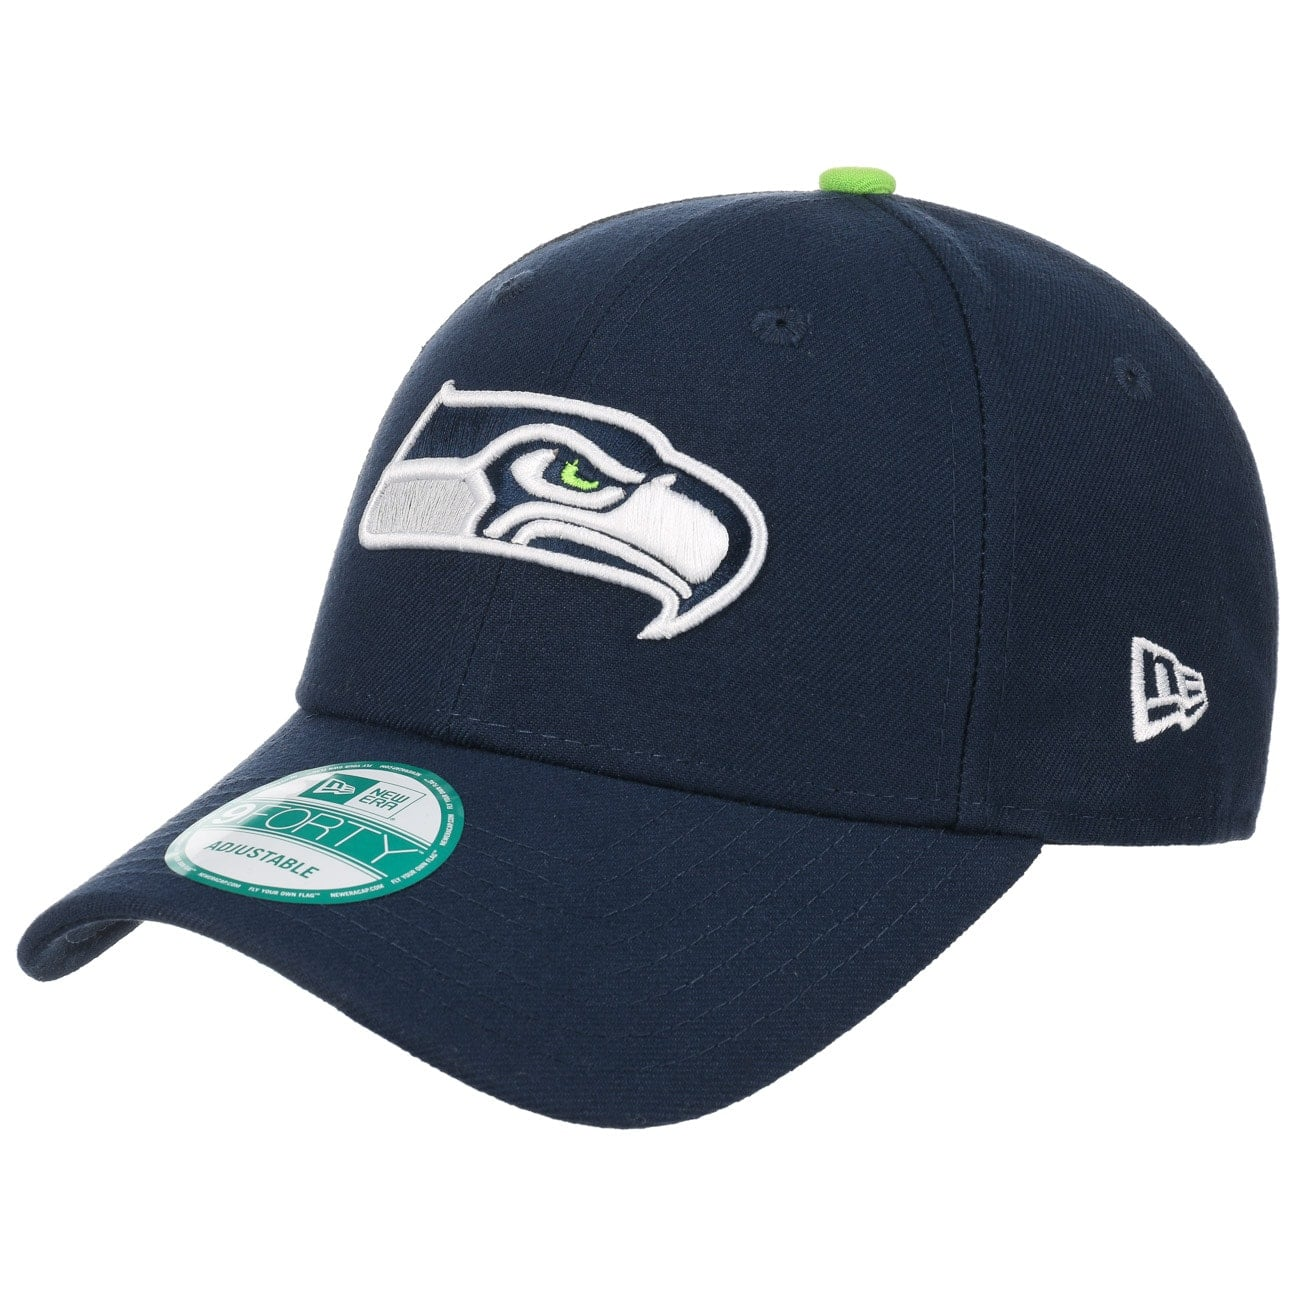 9Forty Seahawks Cap by New Era  gorra de b?isbol